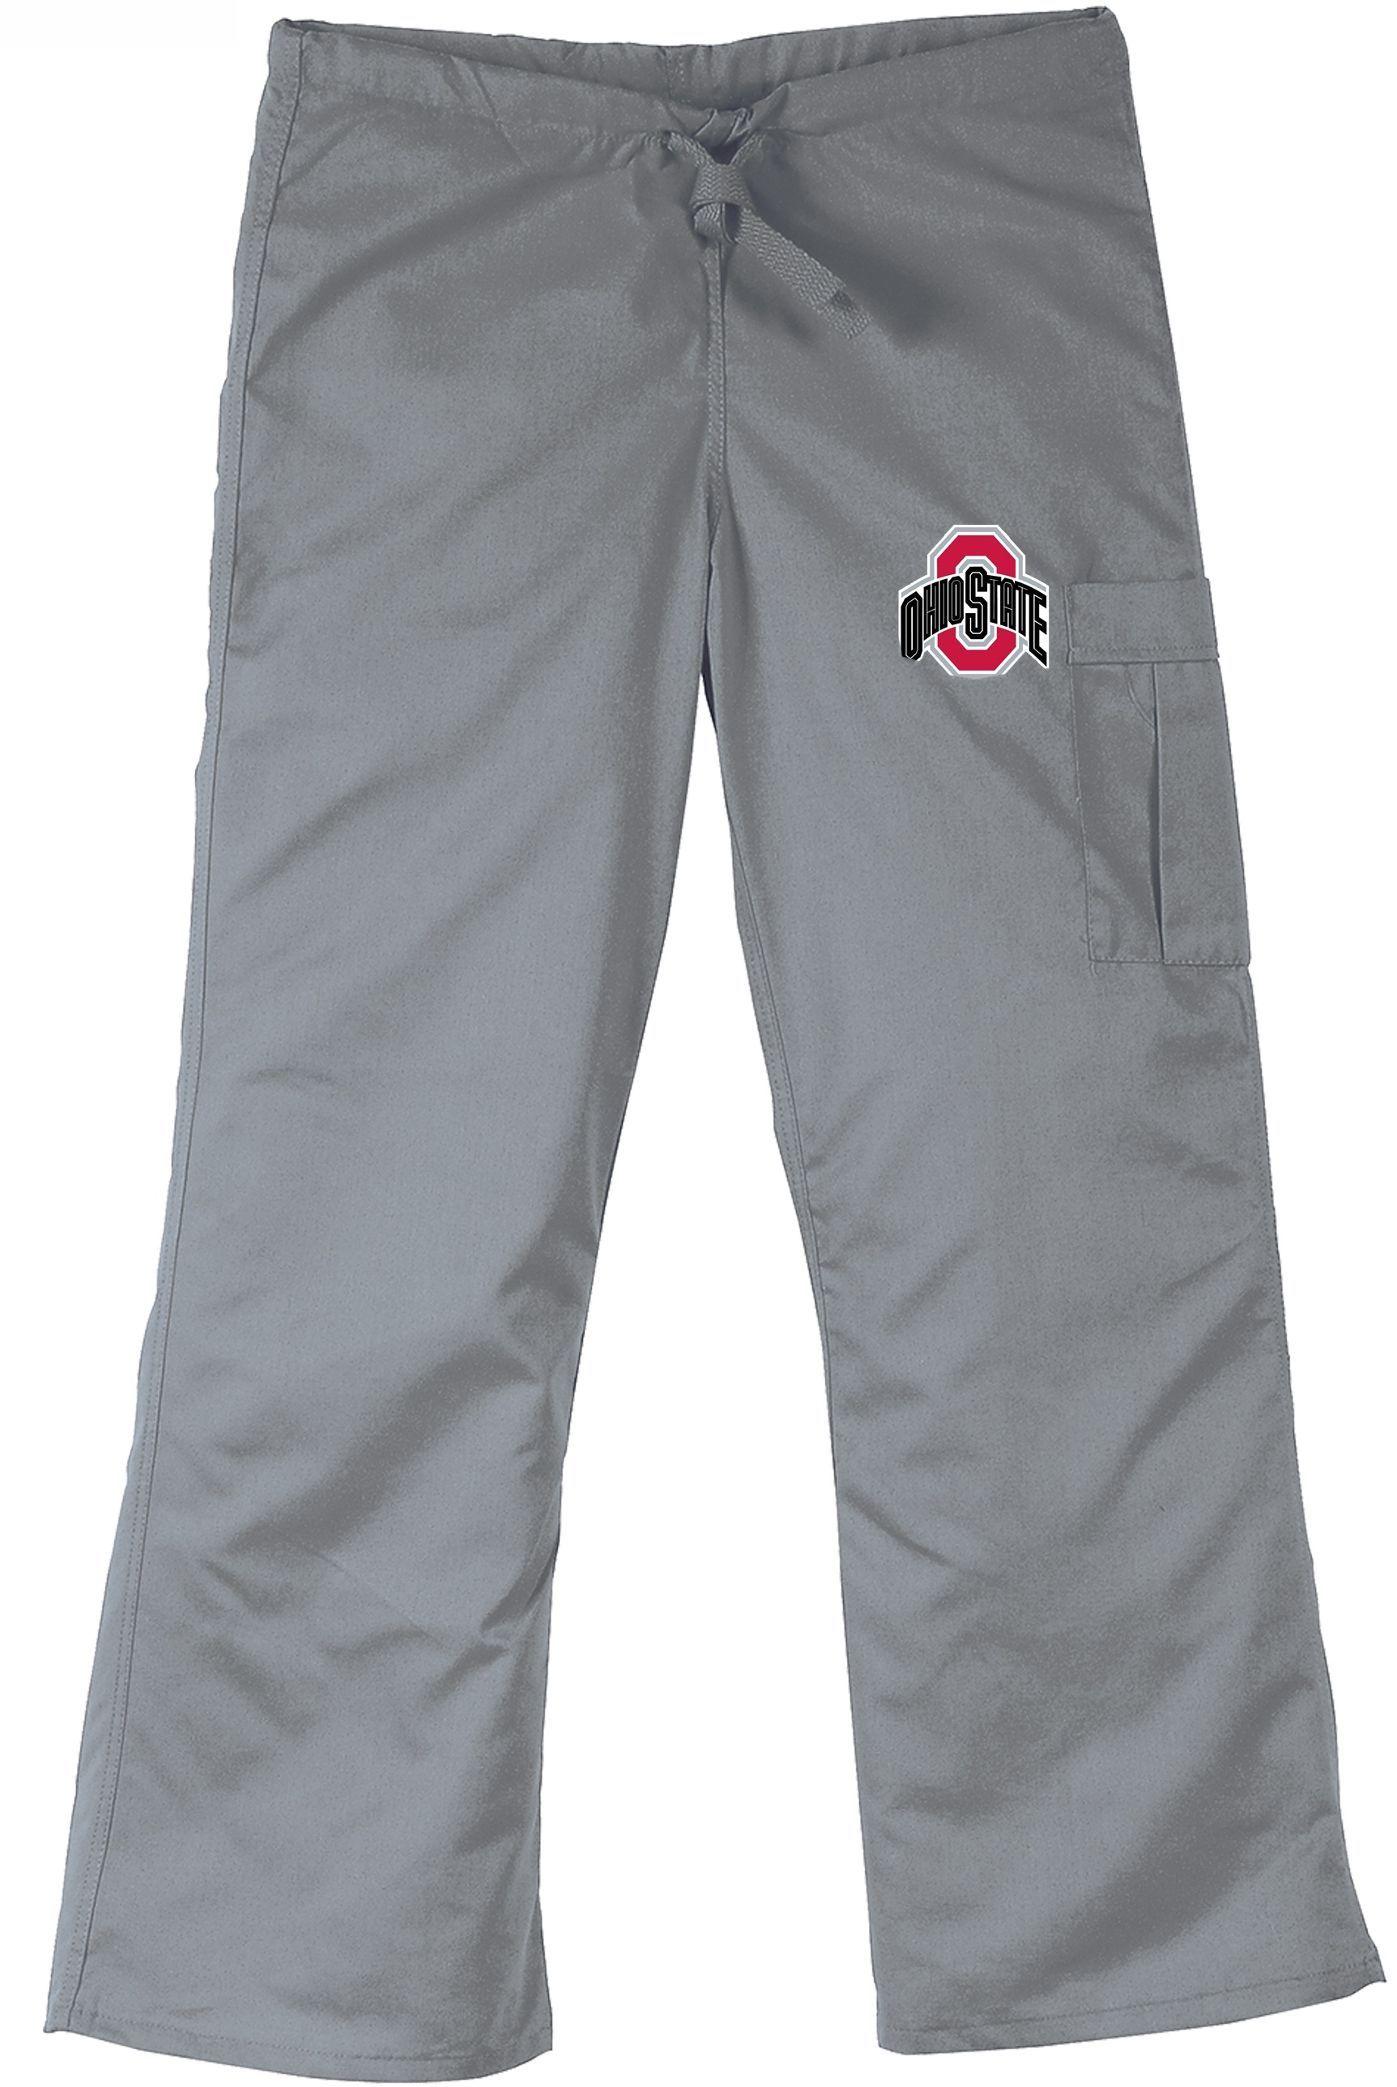 ohio state buckeyes black cargo scrub pants ohio state scrubs ohio state buckeyes gray cargo scrub pants